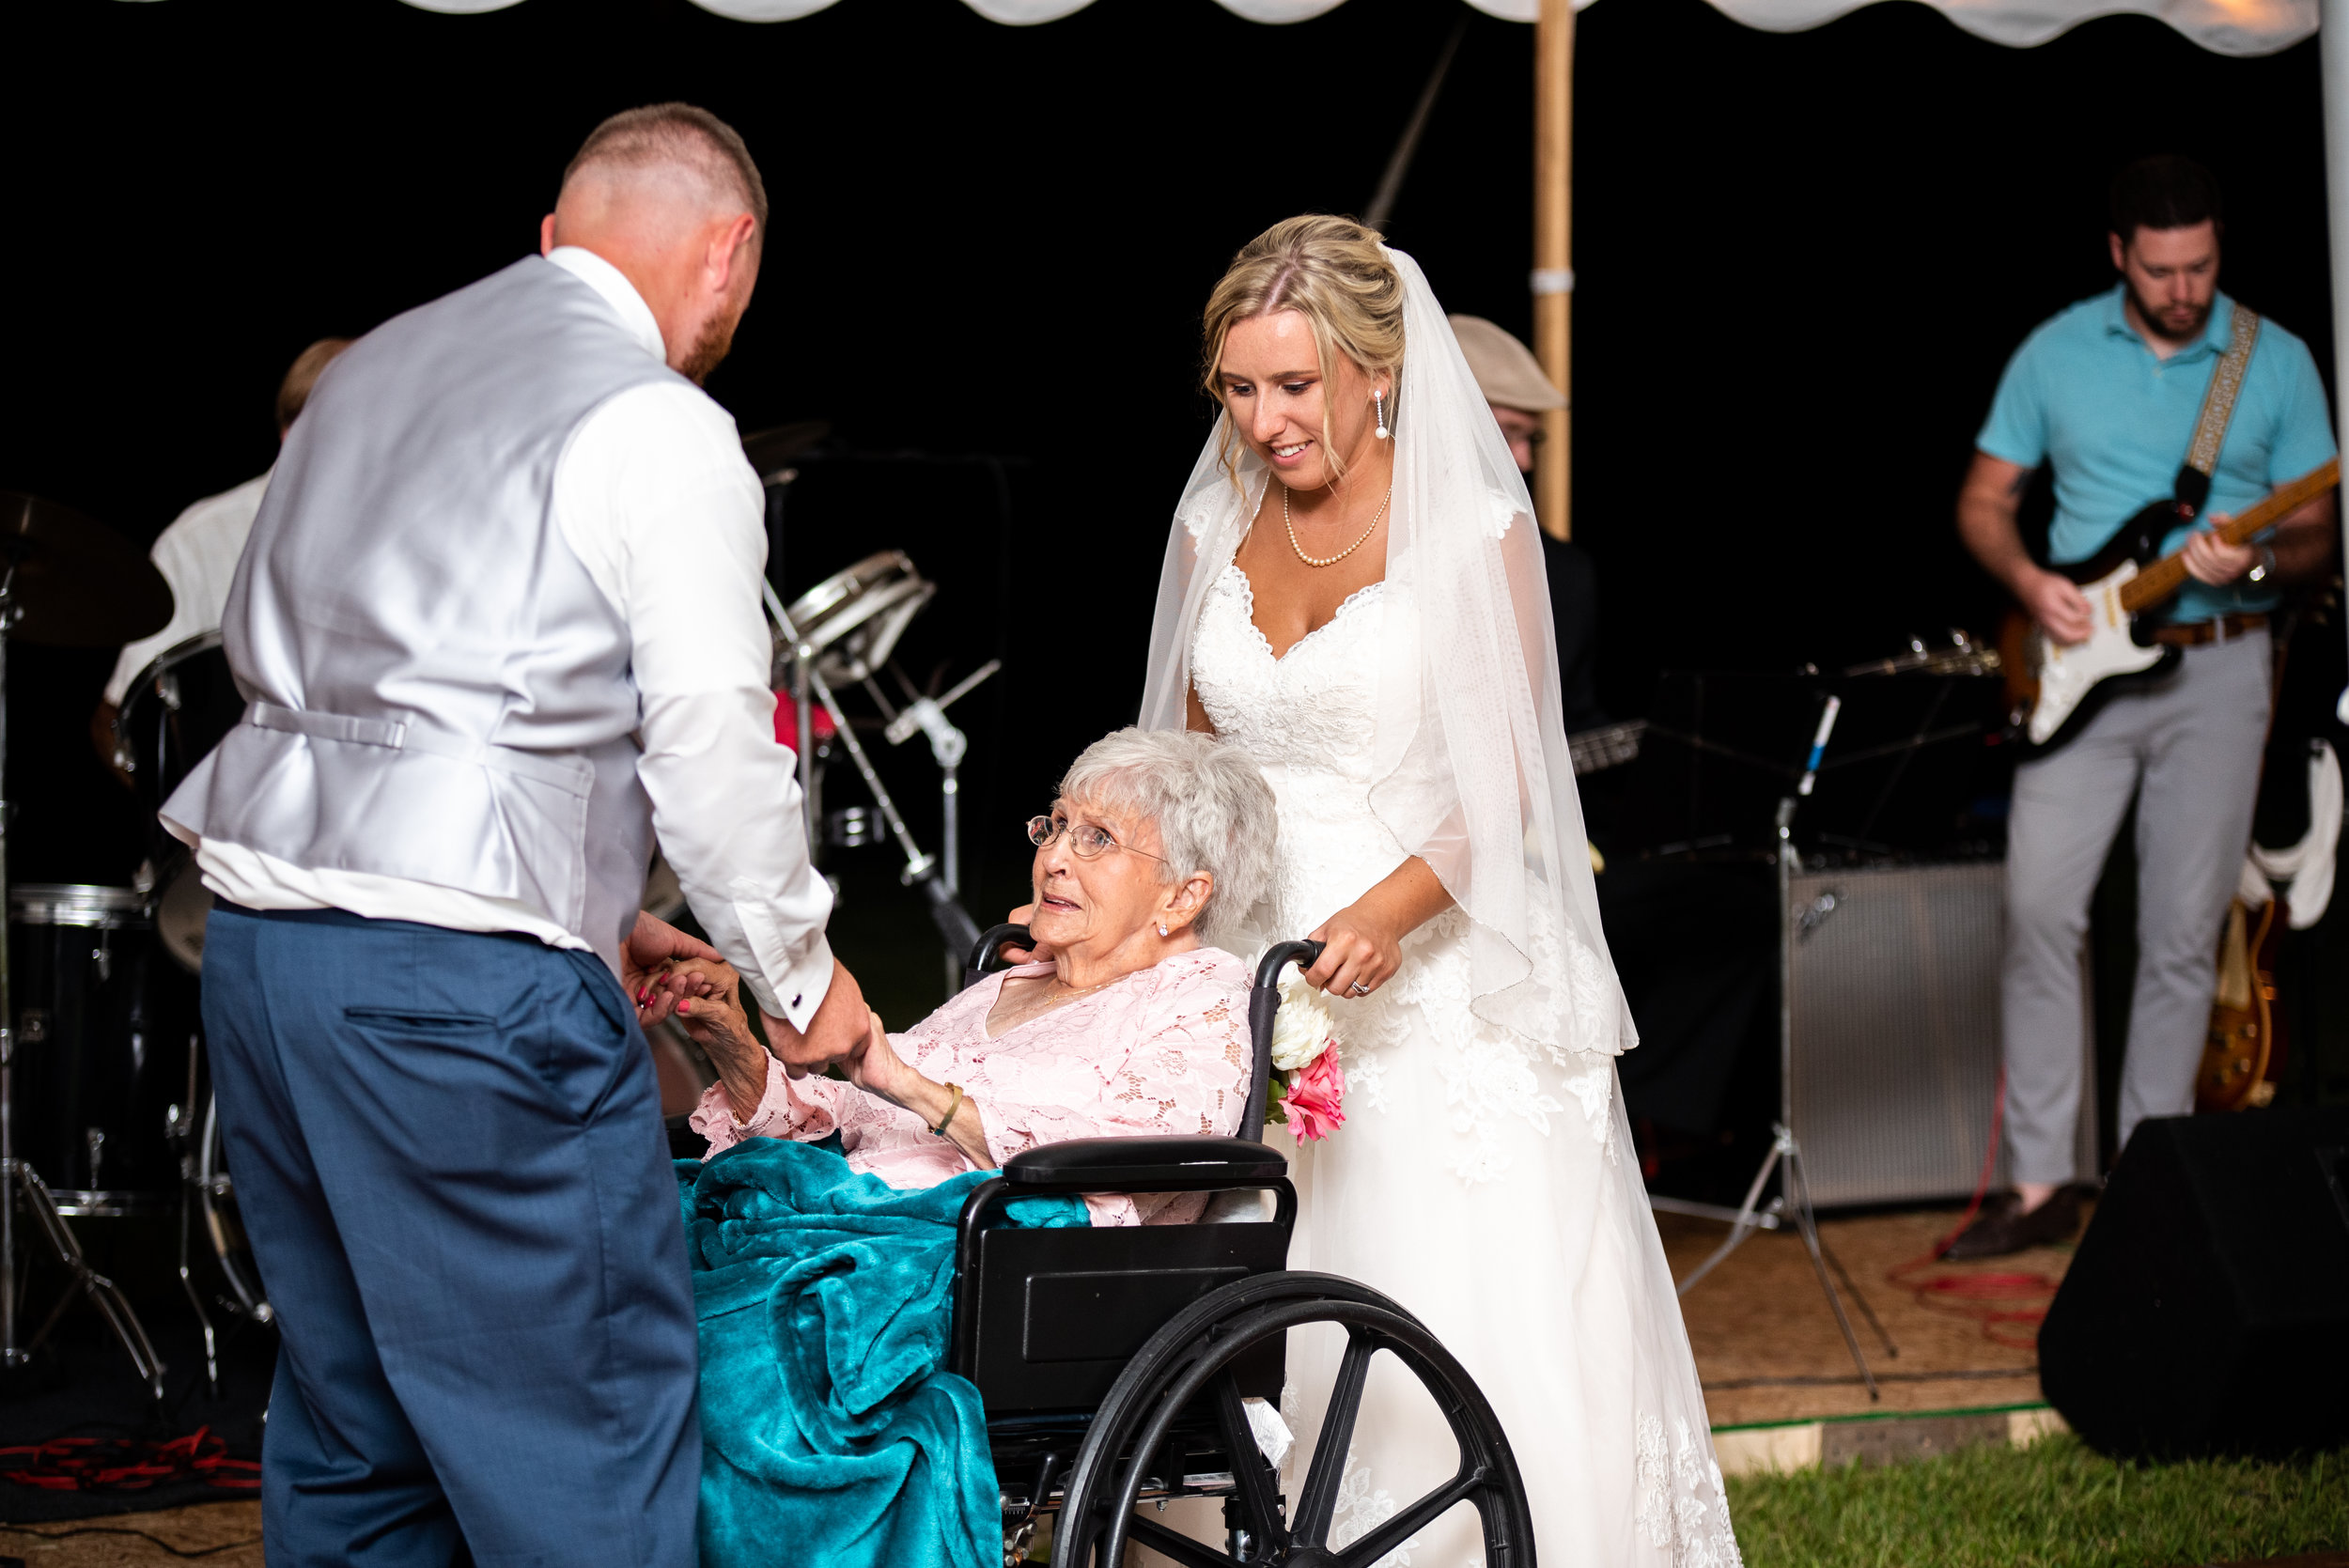 wedding (1 of 1)-224.jpg